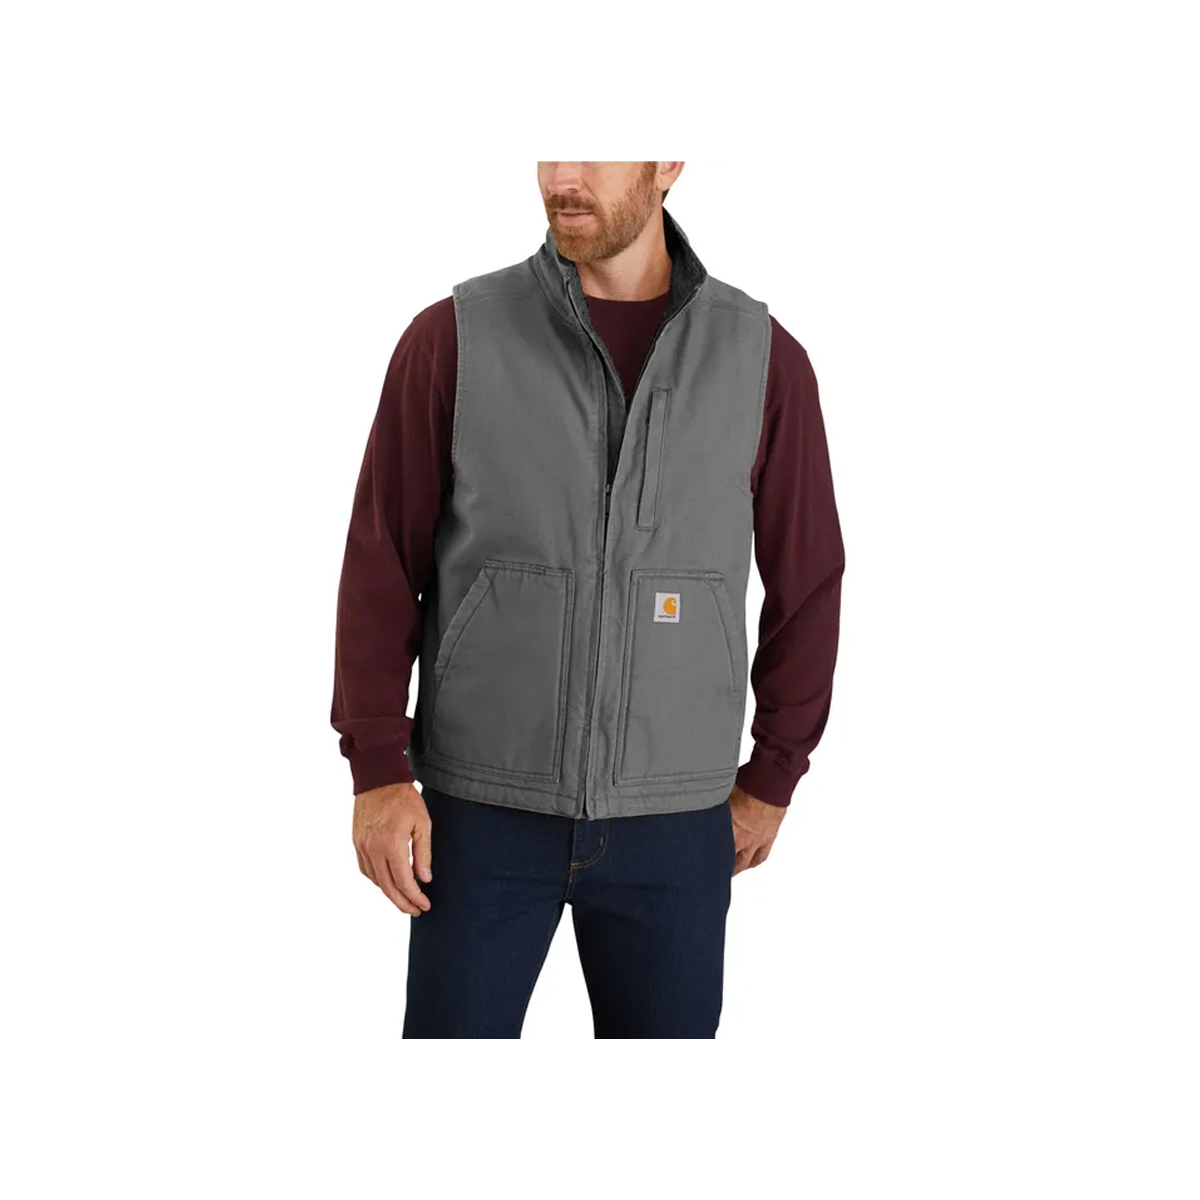 Men's Washed Duck Mock Neck Vest, Dark Gray,Pewter,Slate, swatch